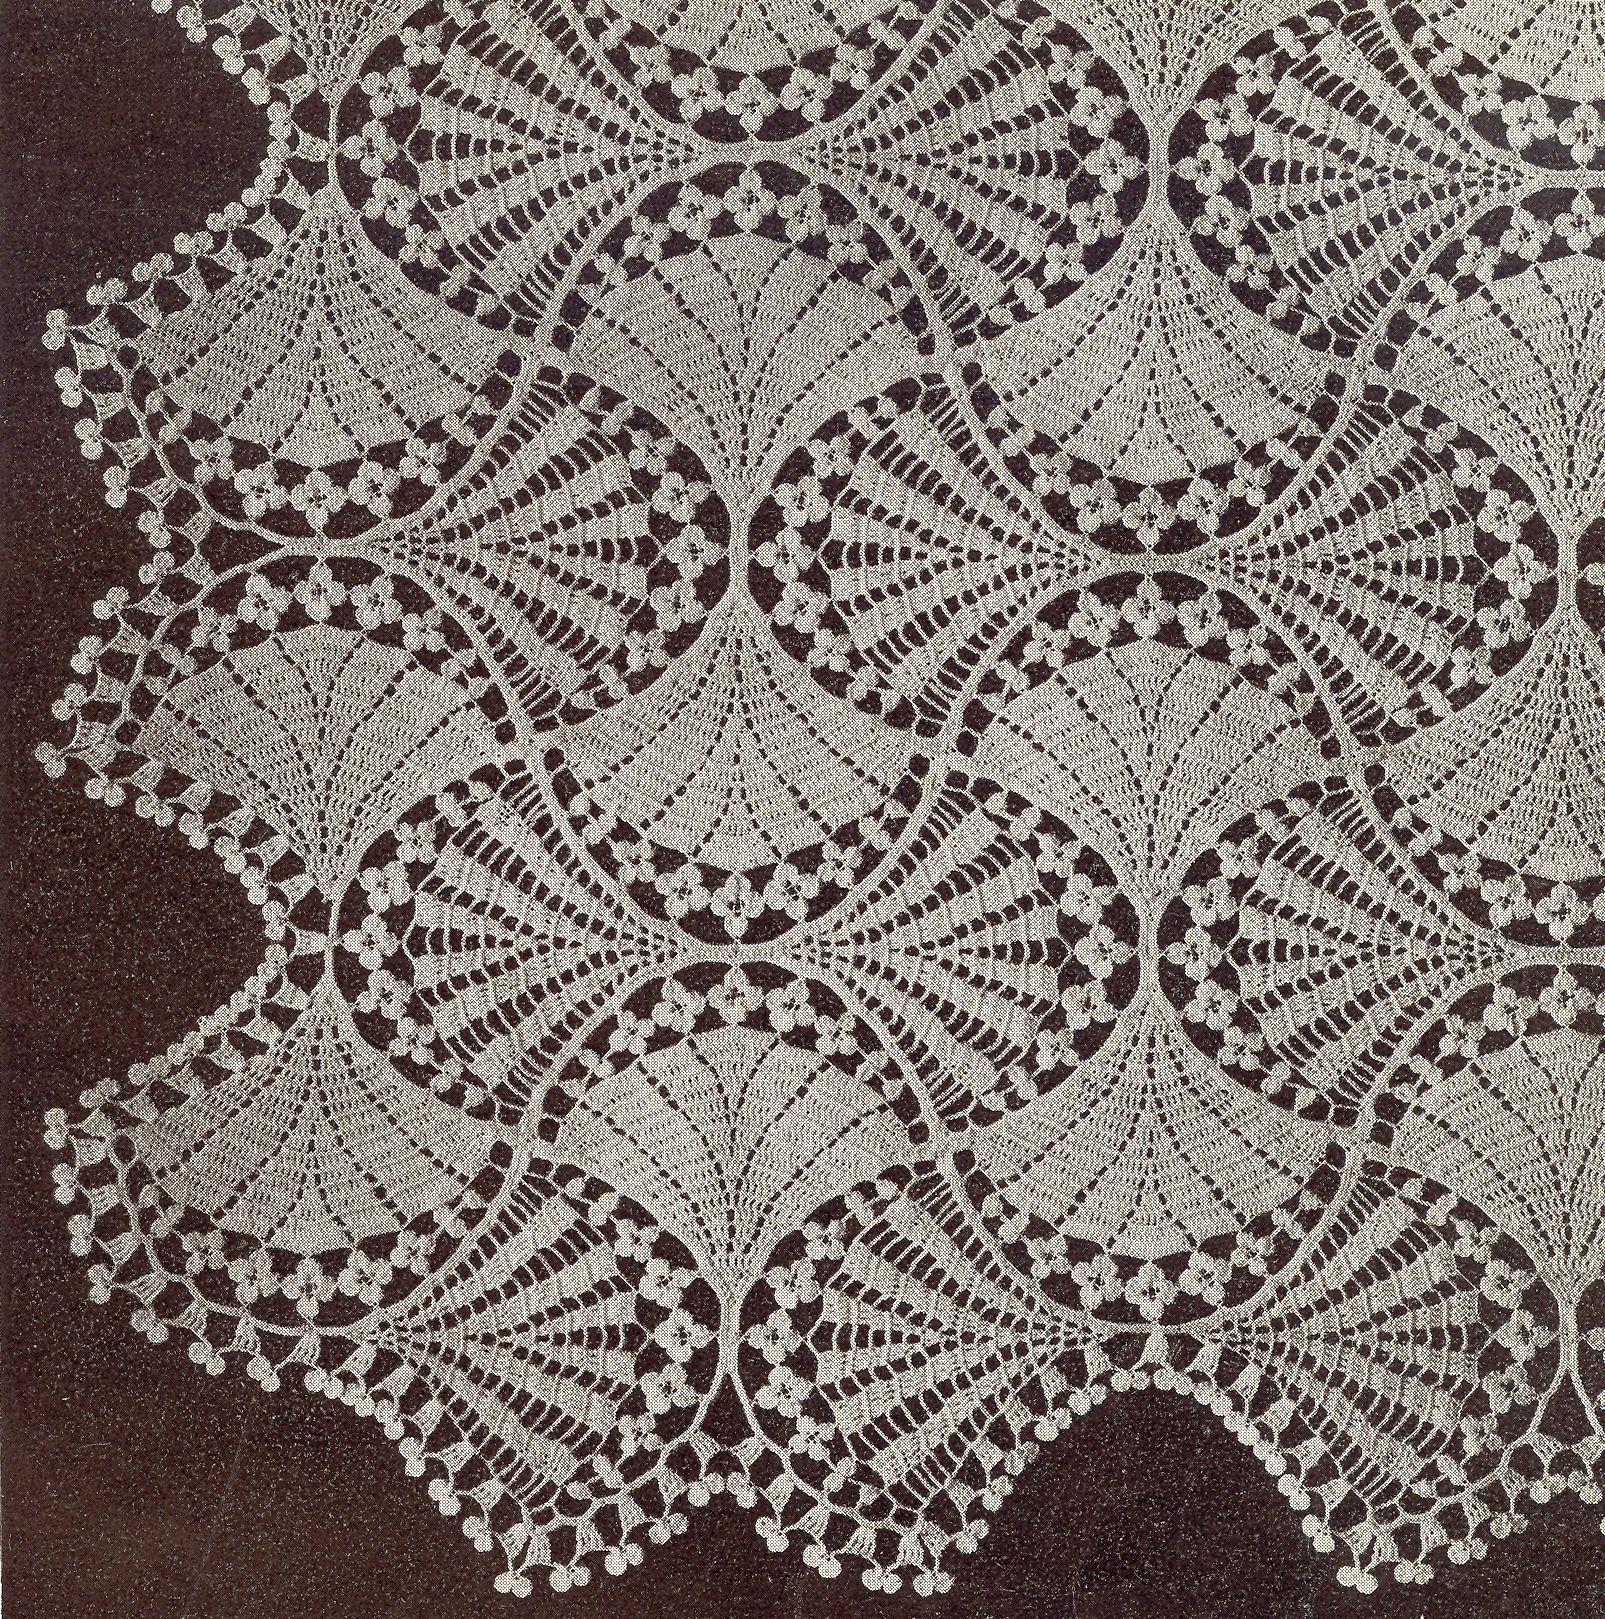 Beautiful Bedspread Patterni Love This Skerin Get A Free